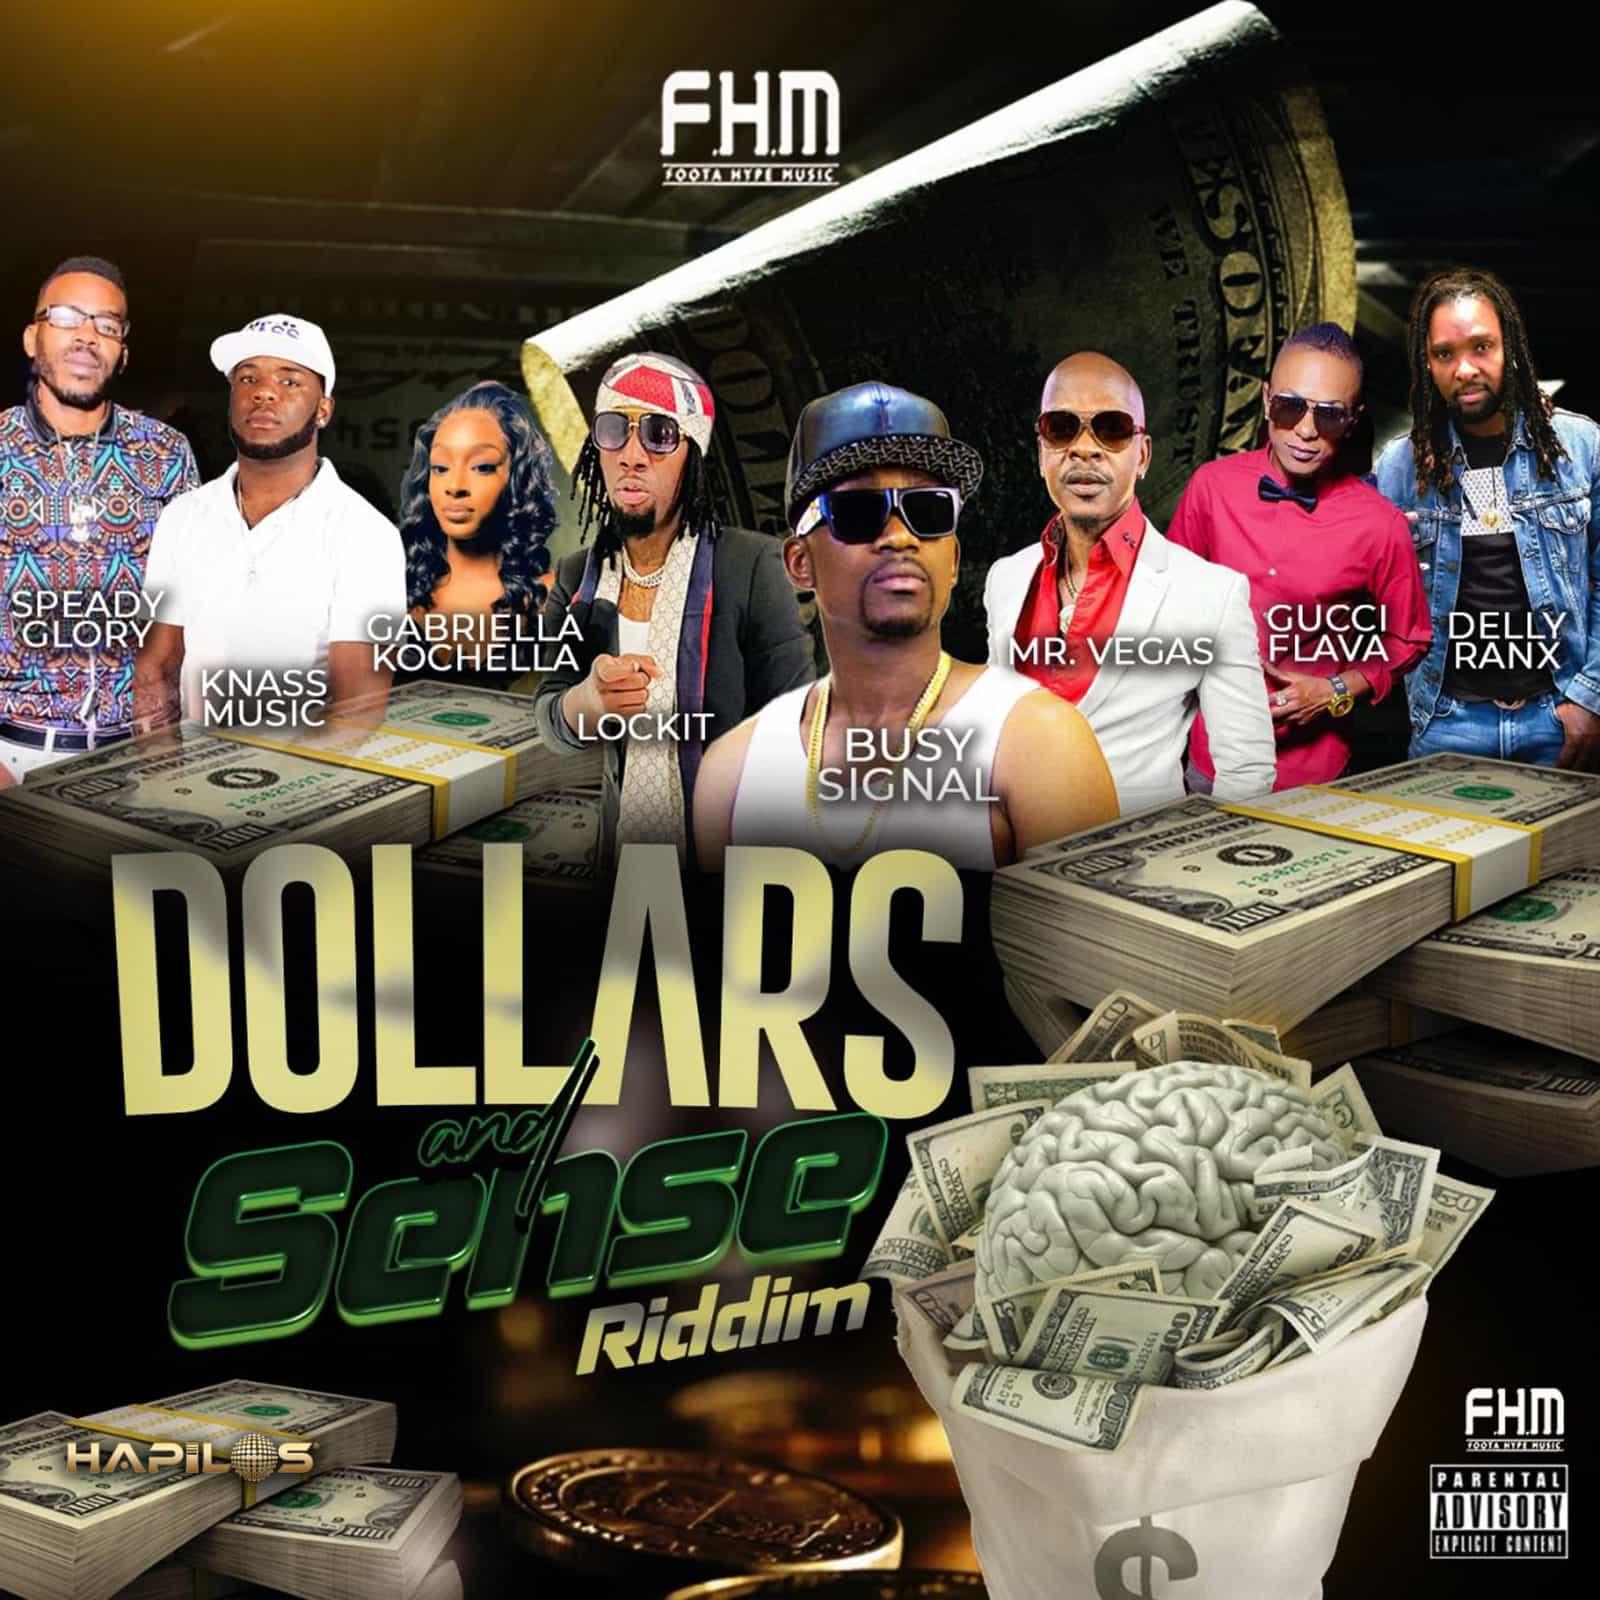 Dollars and Sense Riddim - Foota Hype Music